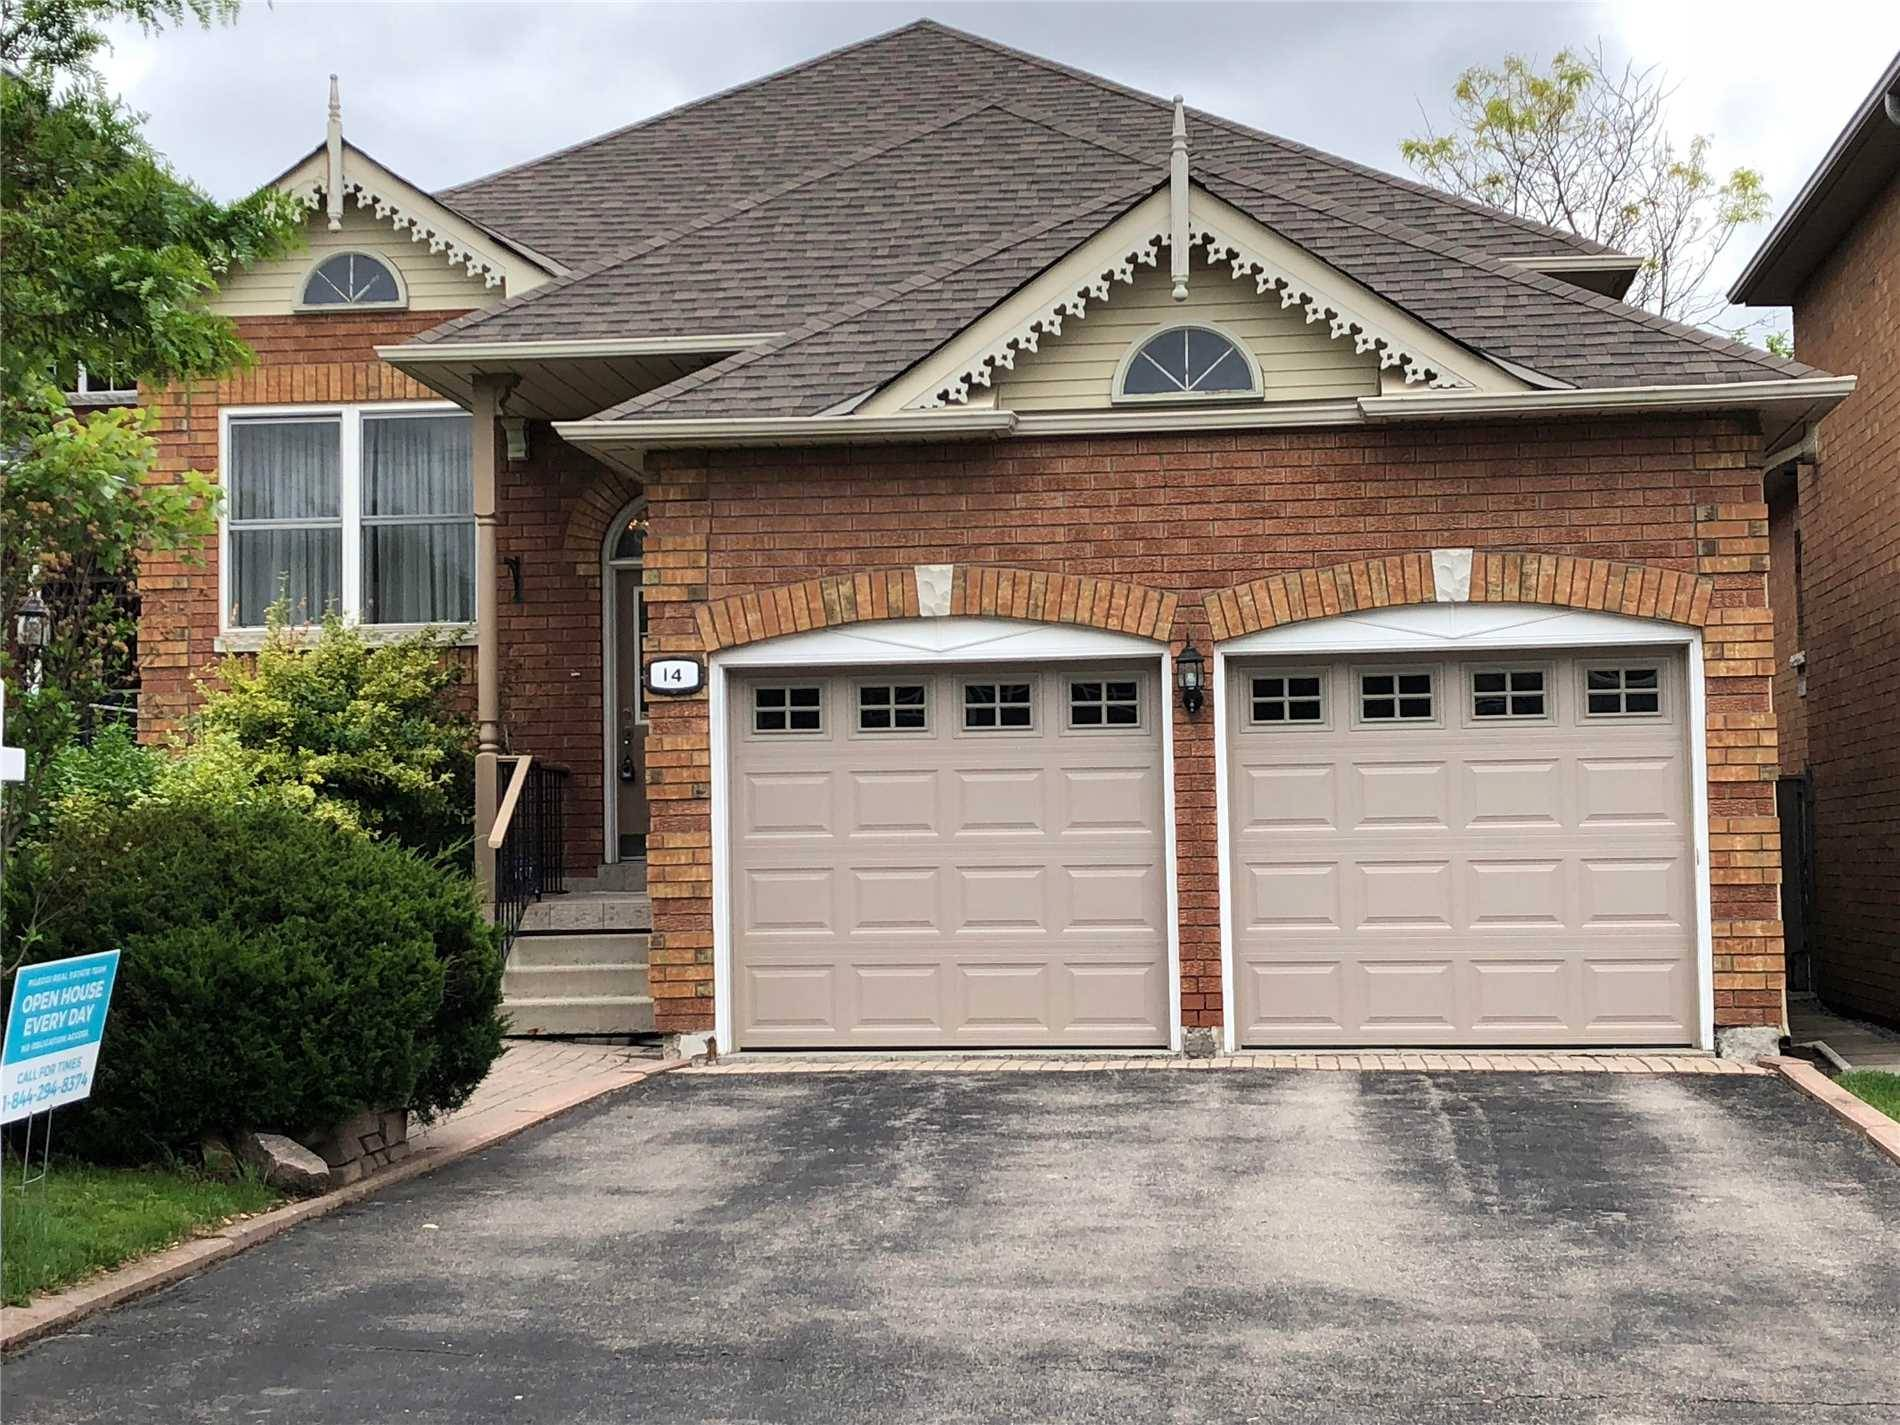 House for sale at 14 Hadley Ct Aurora Ontario - MLS: N4448471